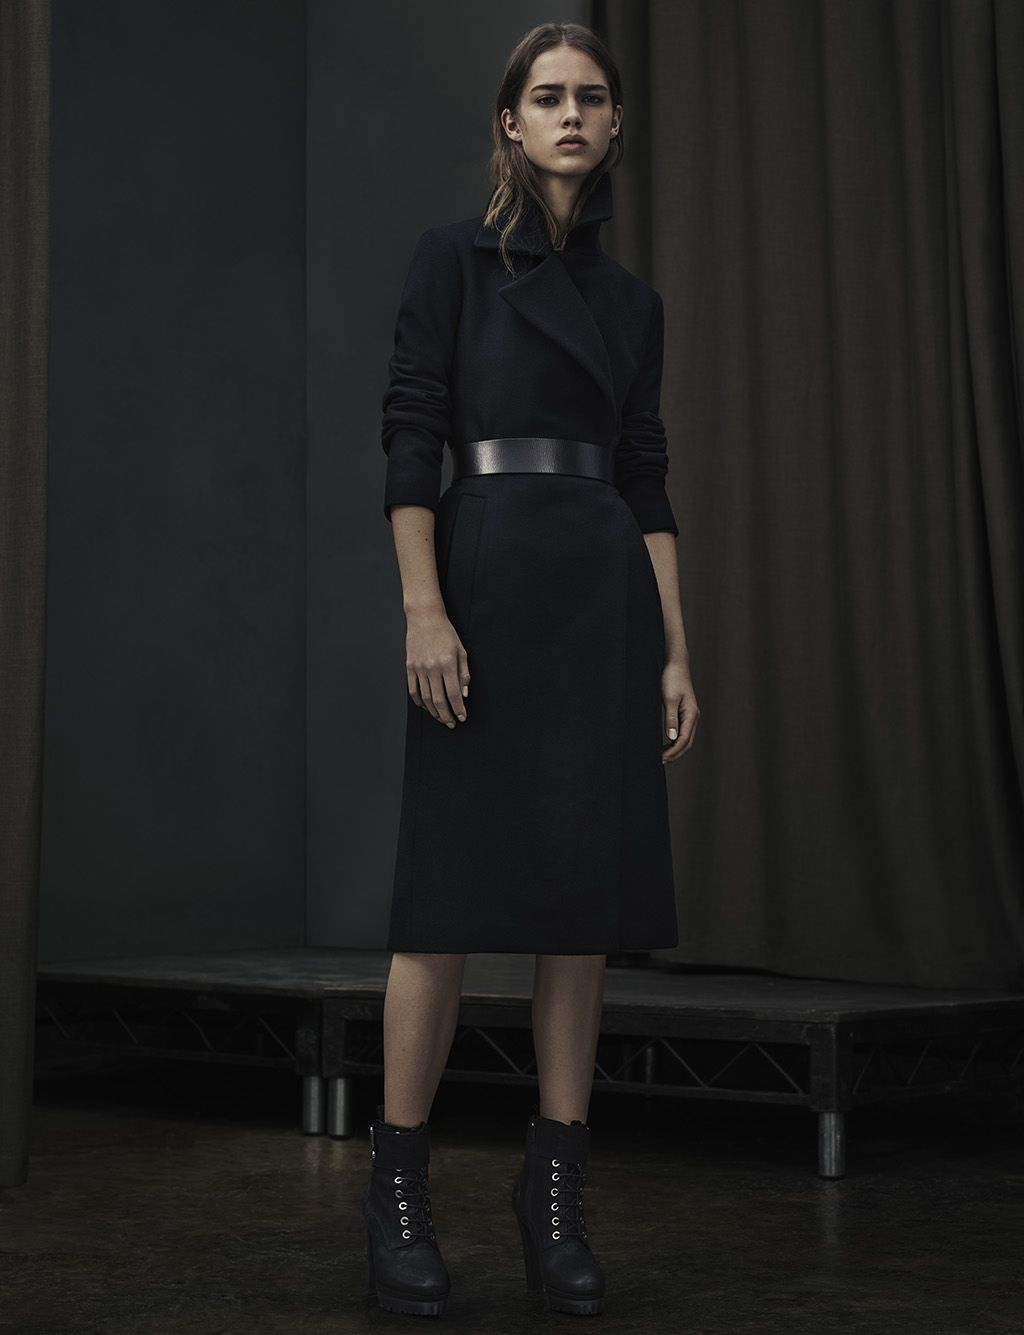 ALLSAINTS WOMEN'S LOOKBOOK NOVEMBER 2015 LOOK 3. The Iya Coat, Mimosa Belt and Balfour Boot.